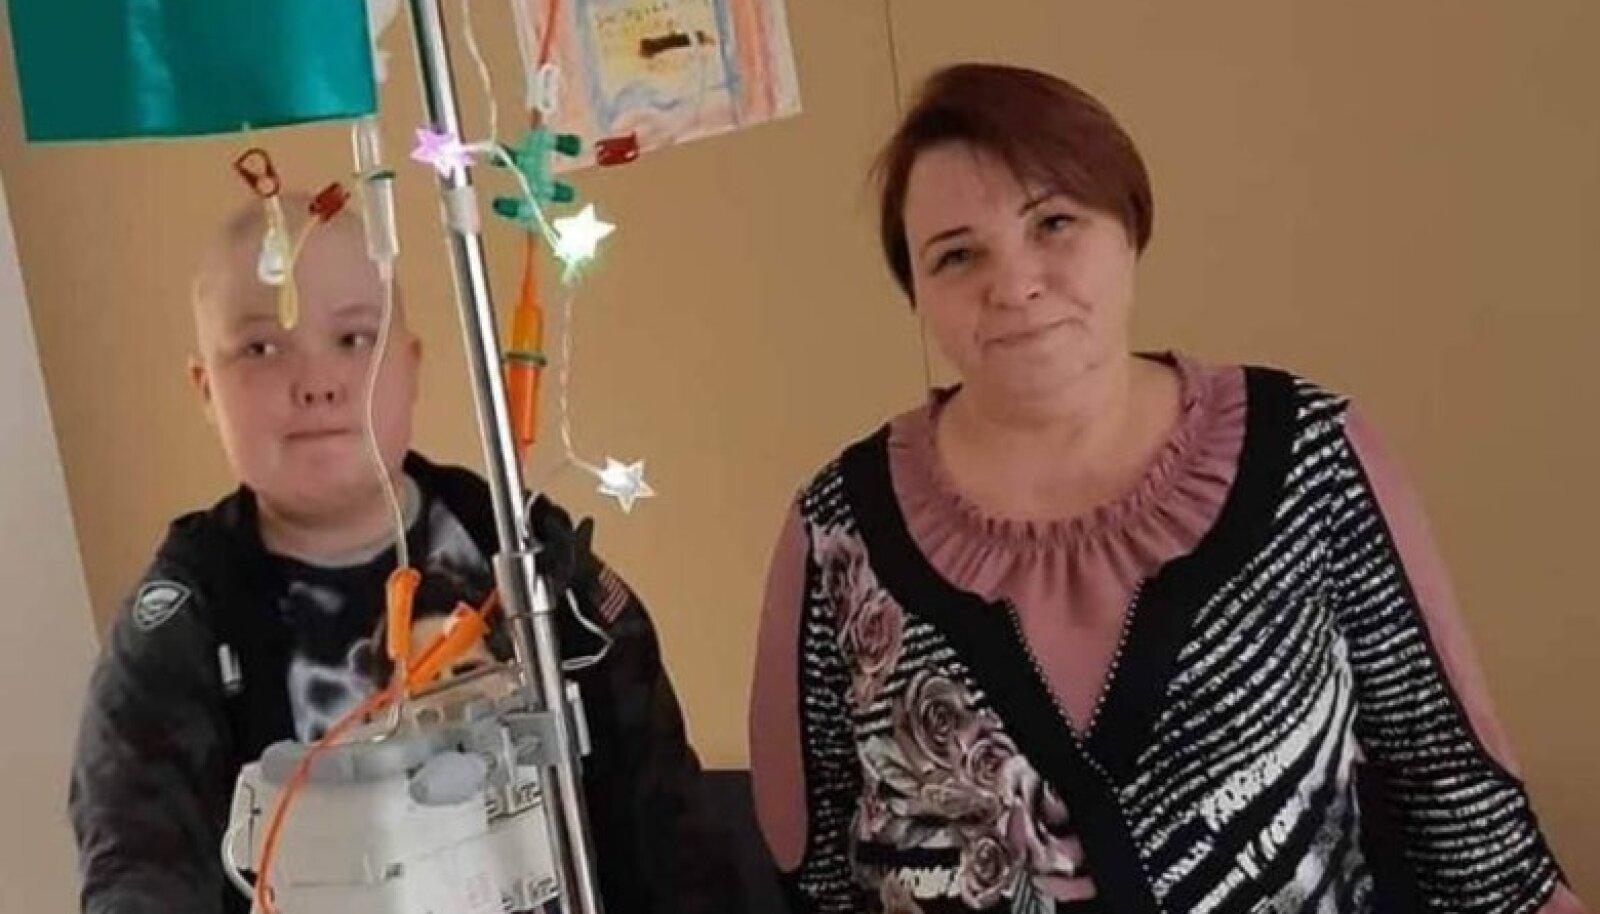 Rasmus ema Ehaga haiglas. Foto: erakogu